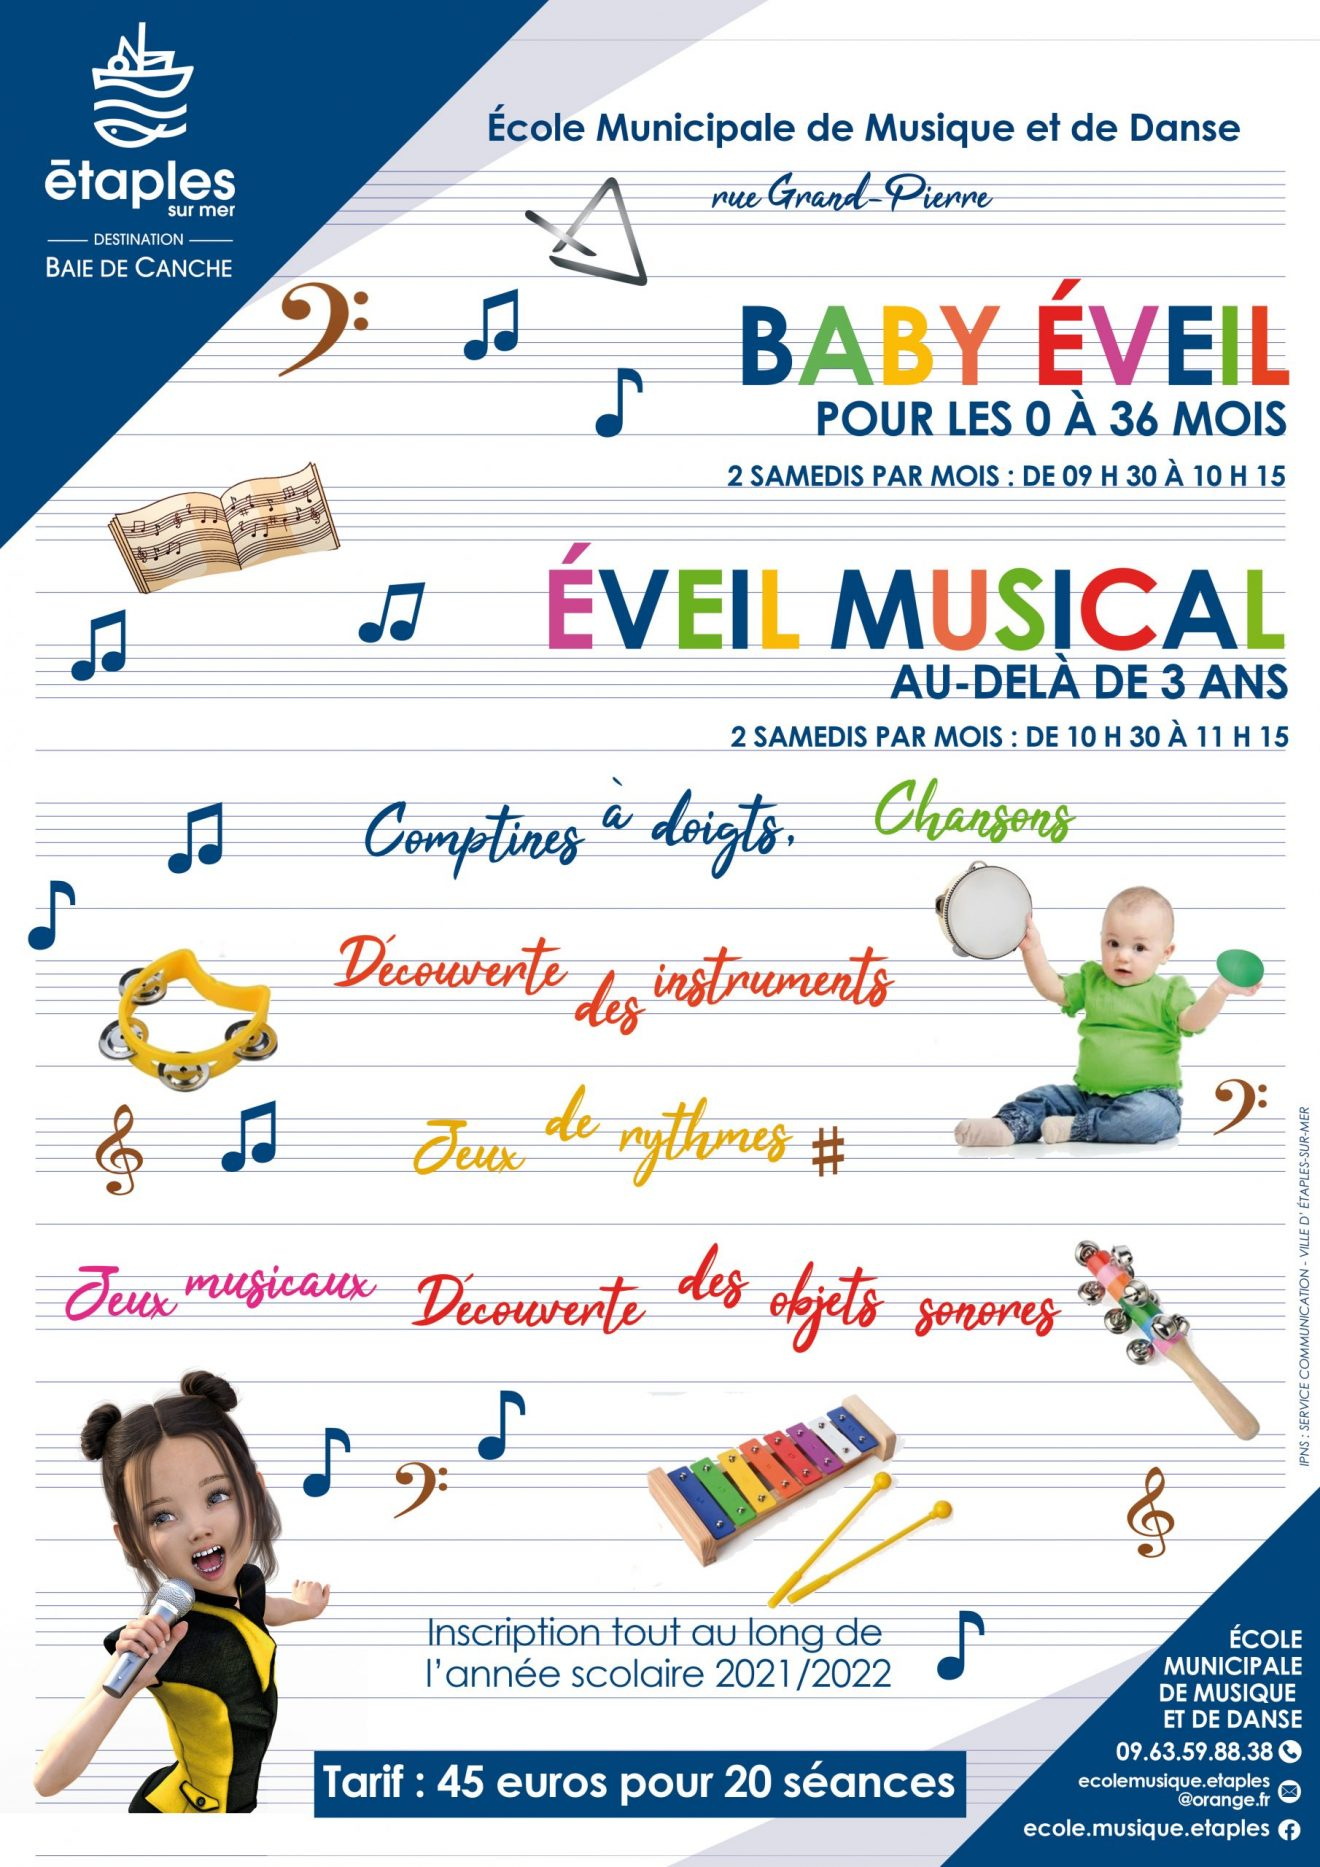 BABY ÉVEIL et ÉVEIL MUSICAL